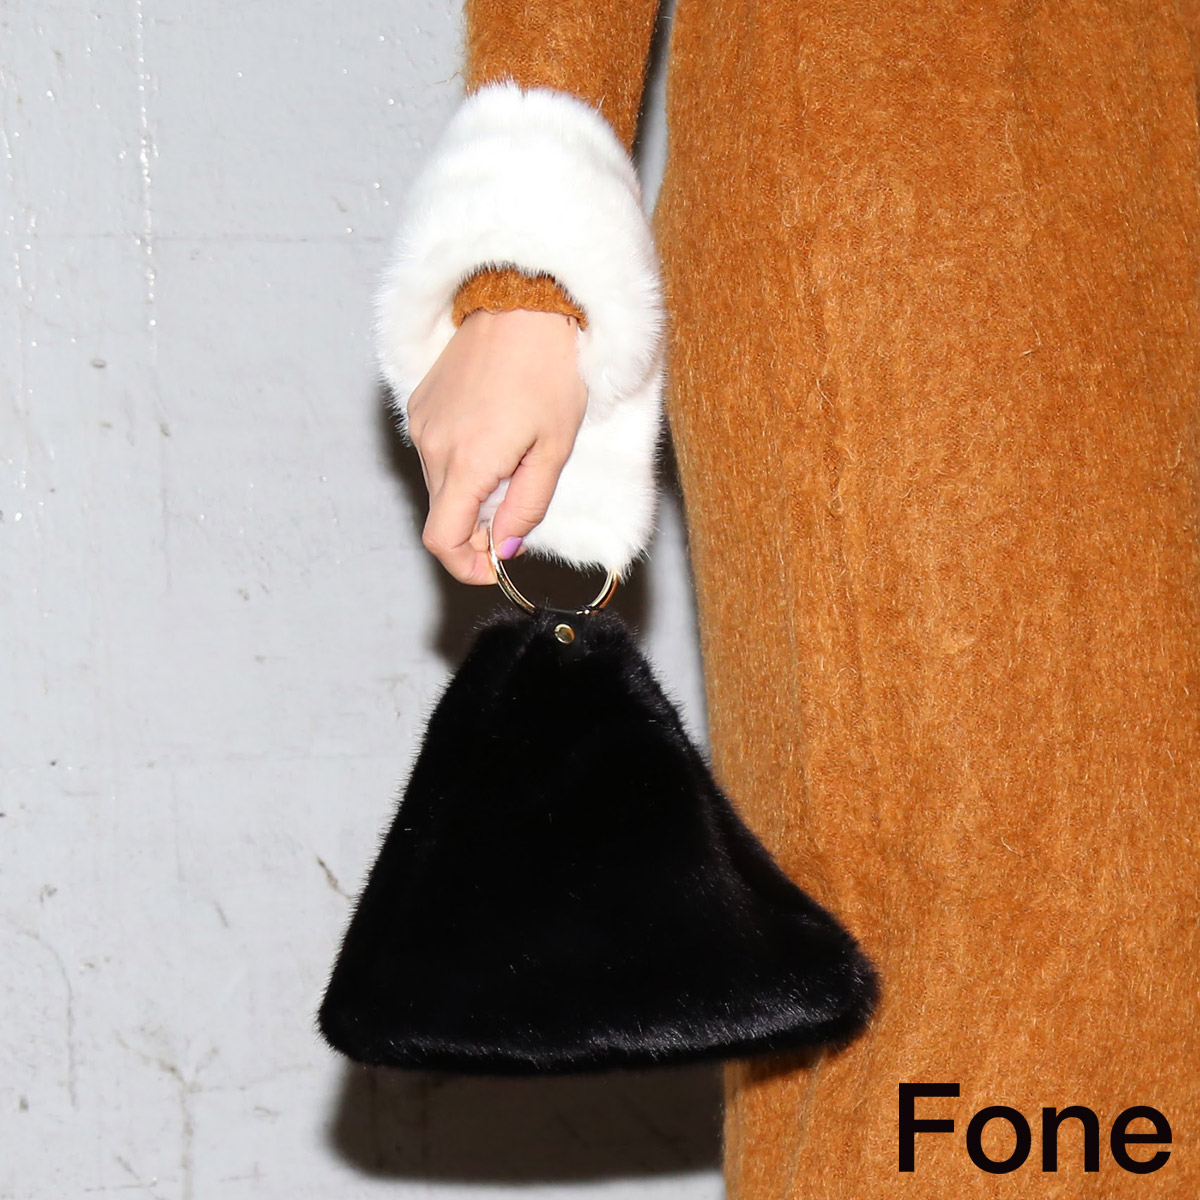 Fone フェイクファー配色 クラッチバッグ(エフワン フェイクファー配色 クラッチバッグ)WHITE×BLACK【レディース テトラバッグ】17FA-I